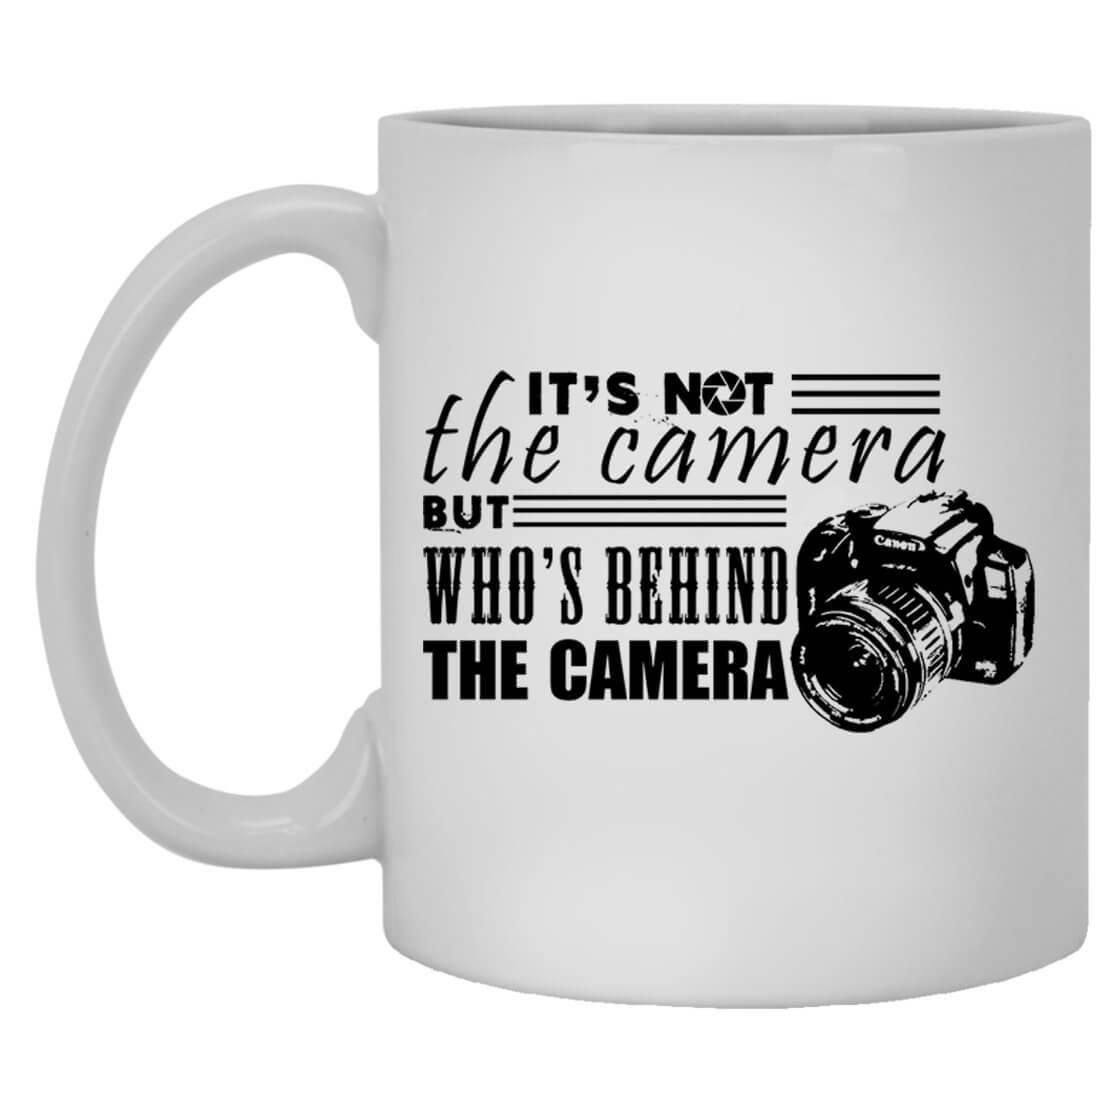 it's not the camera mug